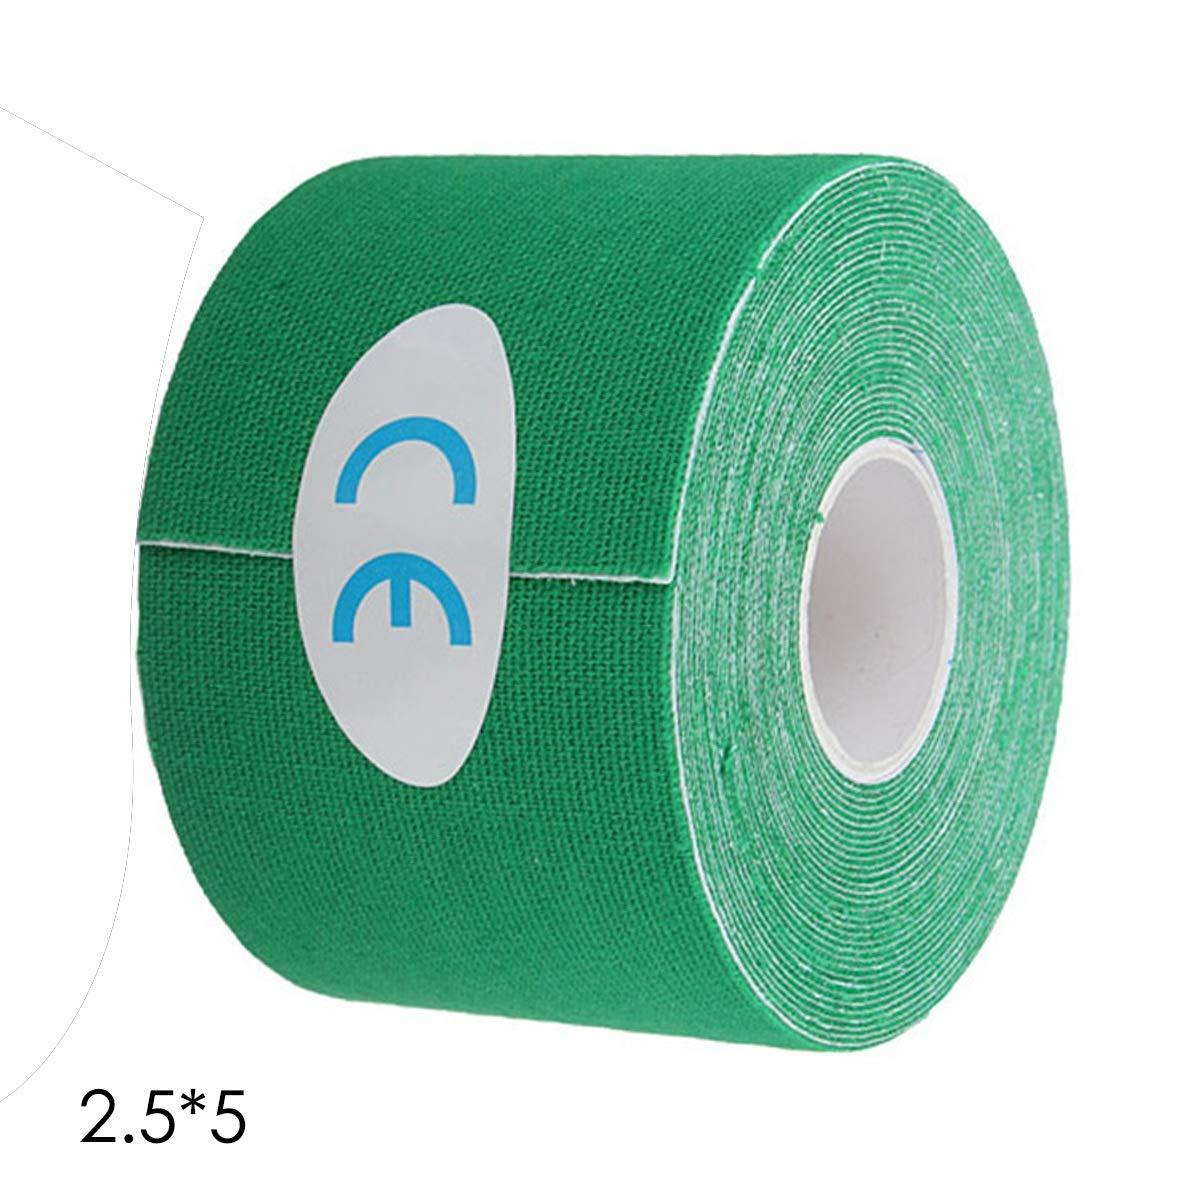 Leyeet Sports キネシオロジーテープ サイオマッスルストレイン 怪我サポート KTスポーツ 5/2.5cm20m  Green5*5cm B07KLHNSFZ